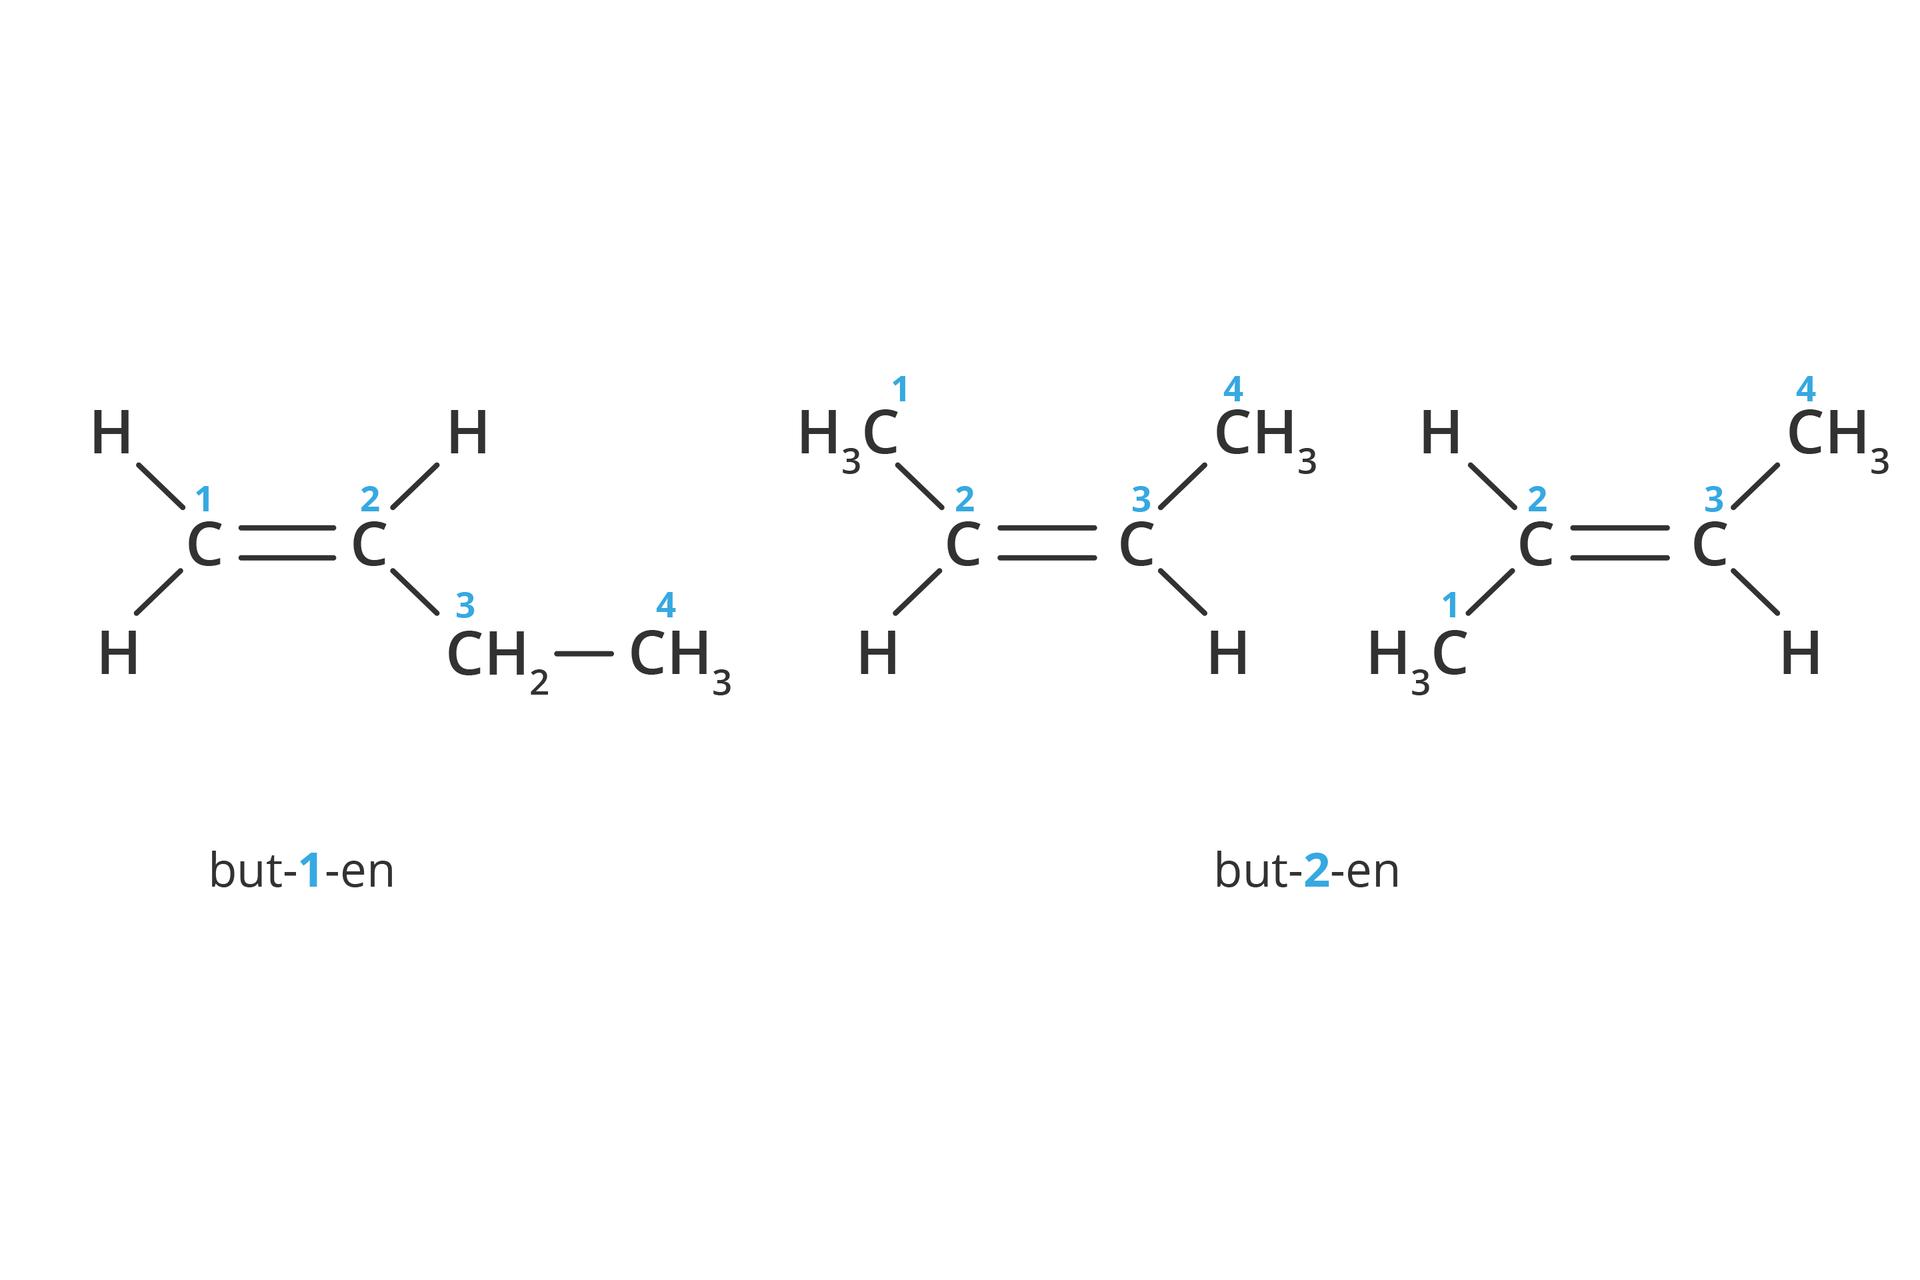 Na rysuku przedstawiono wzory strukturalne but-1-en oraz but-2-en.